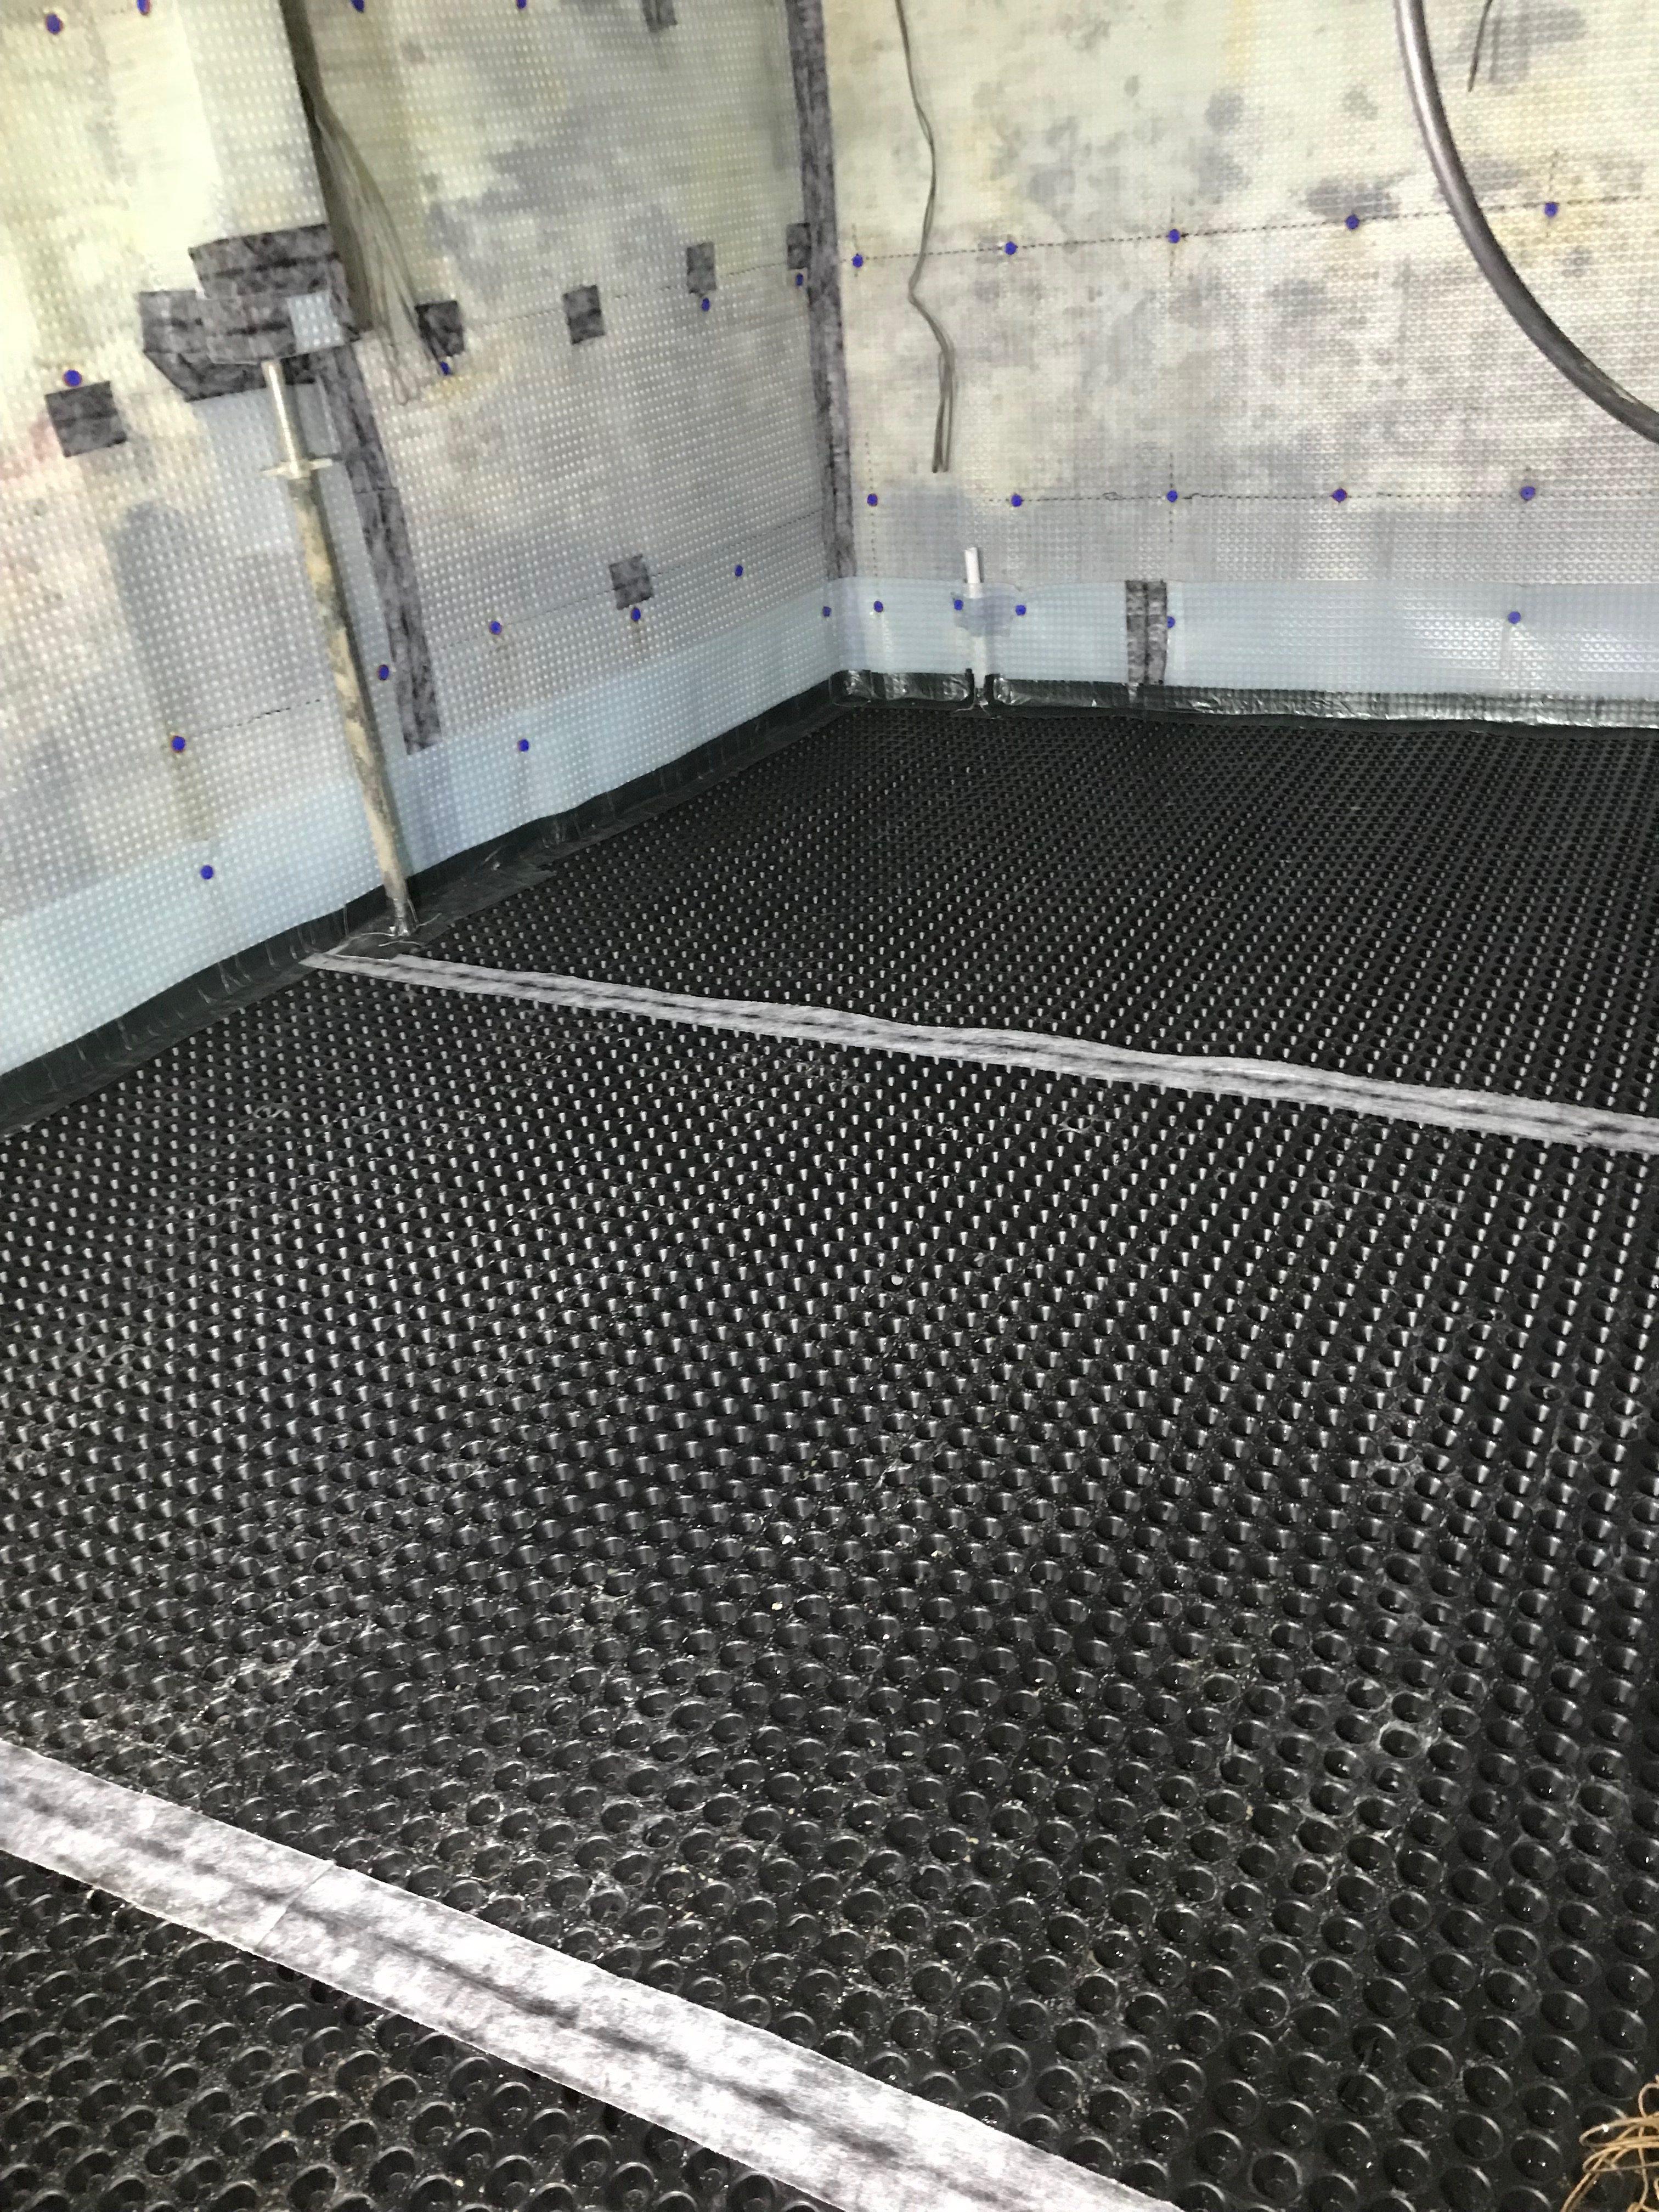 Flooring membrane laid throughout